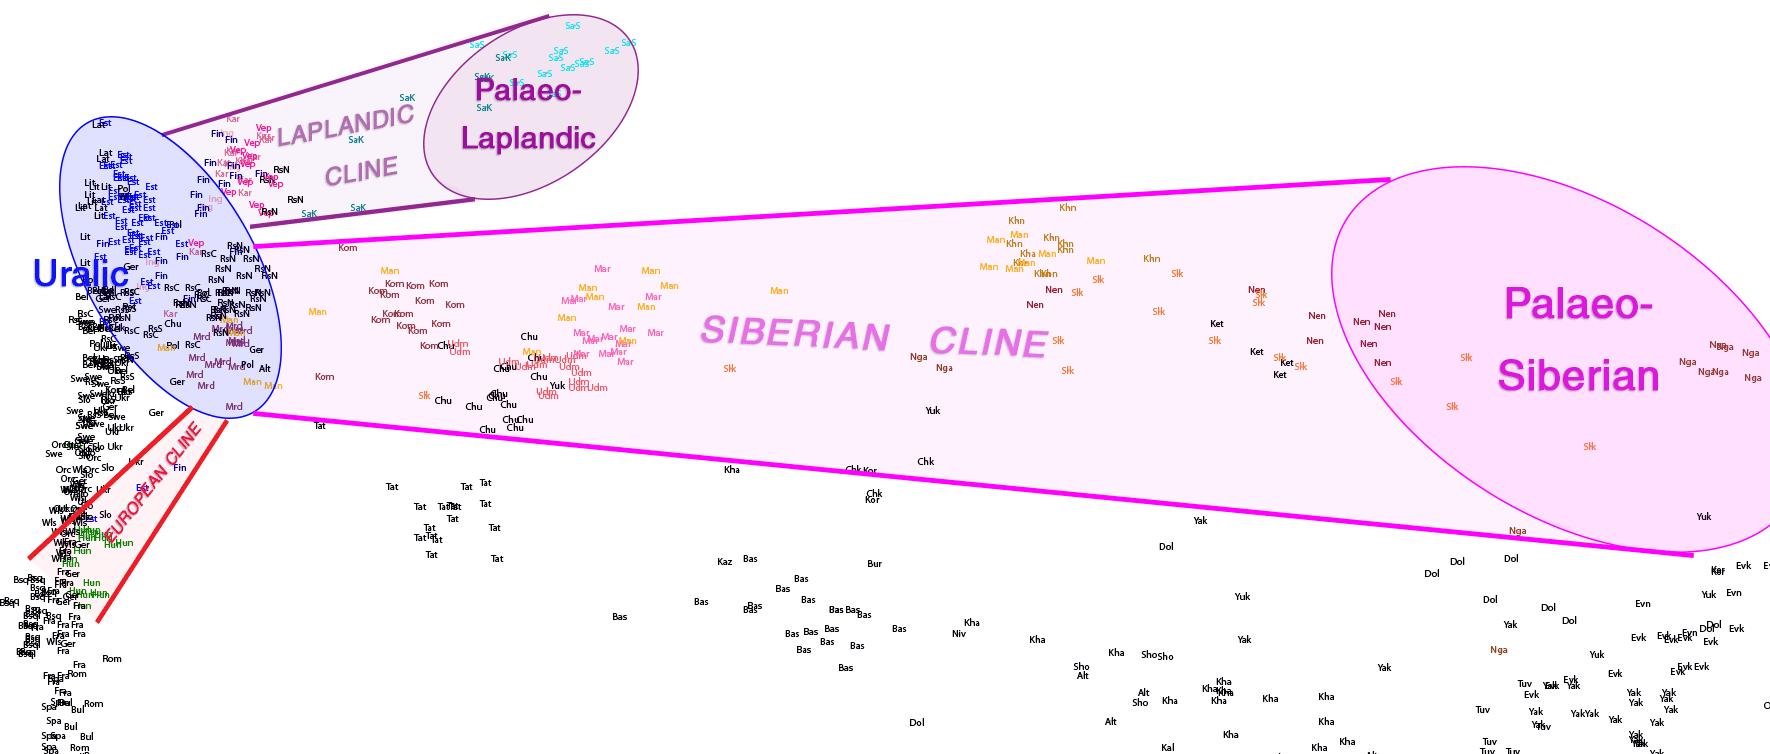 uralic-cline